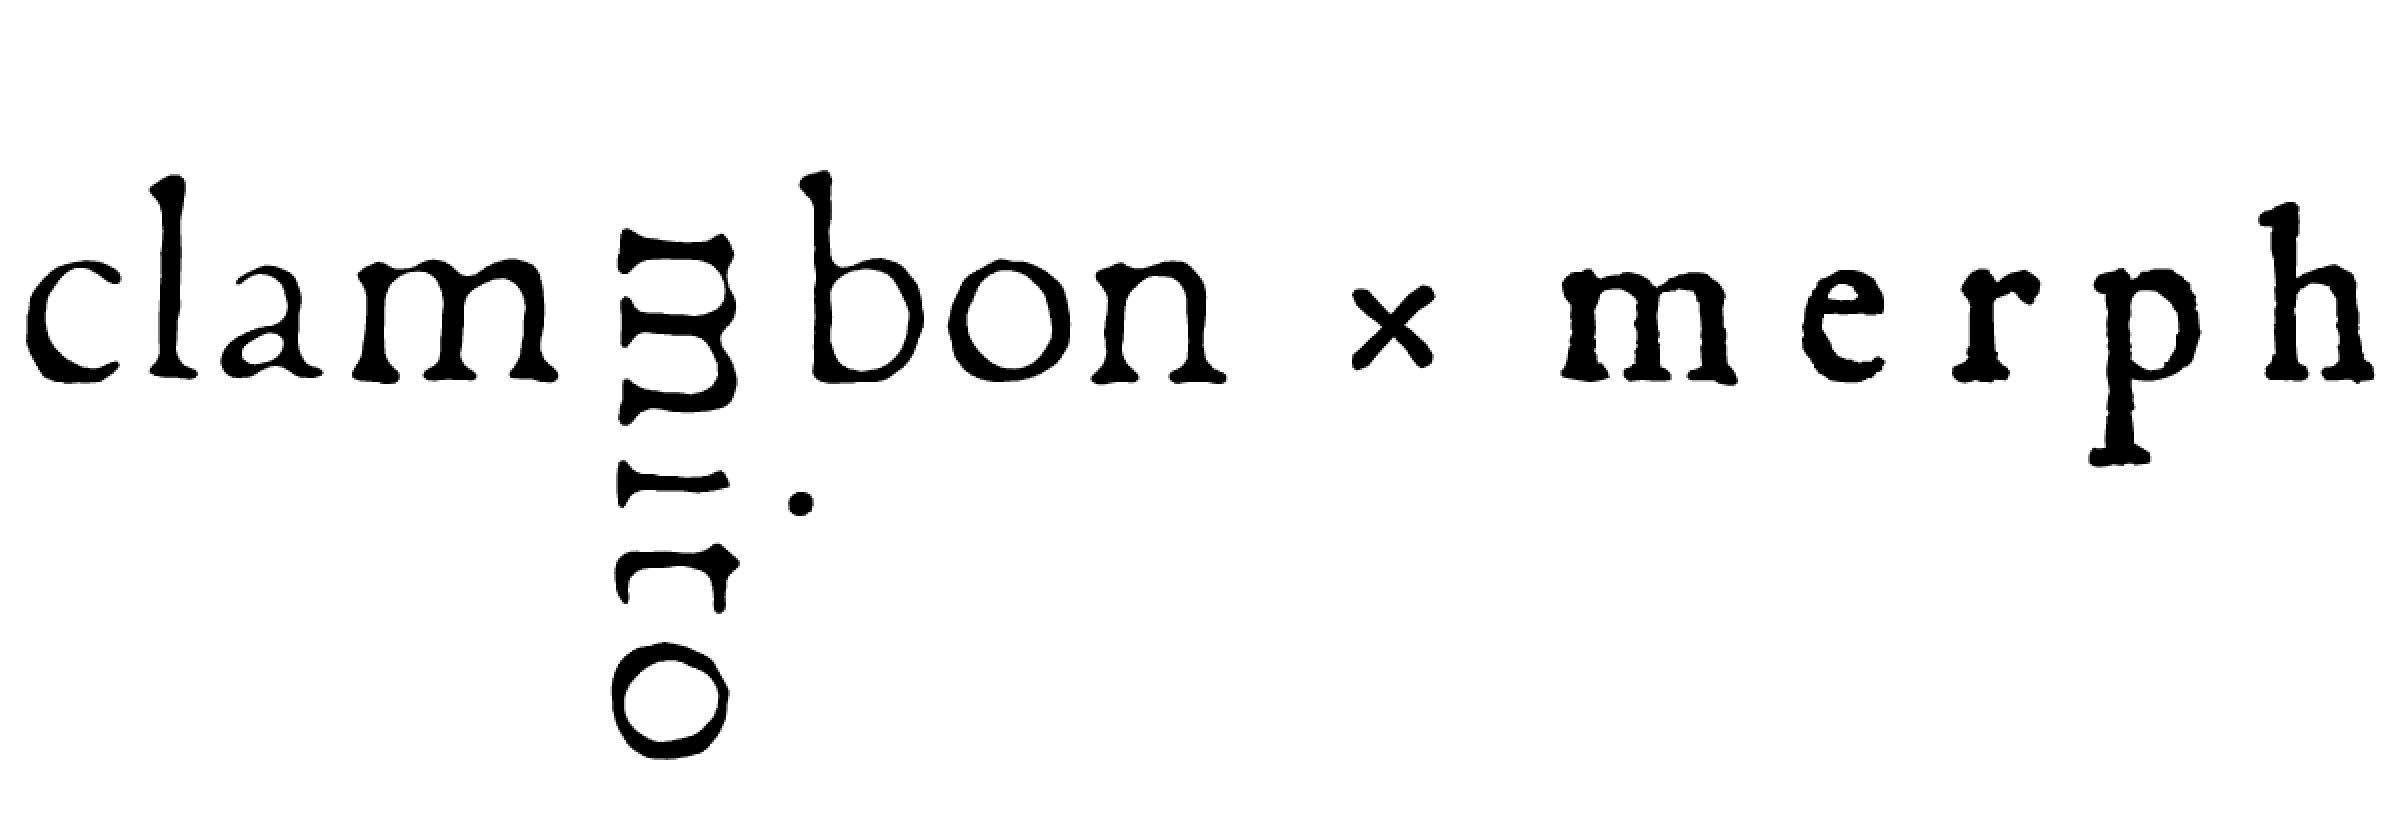 clammbon mito × merph LOGO.jpg